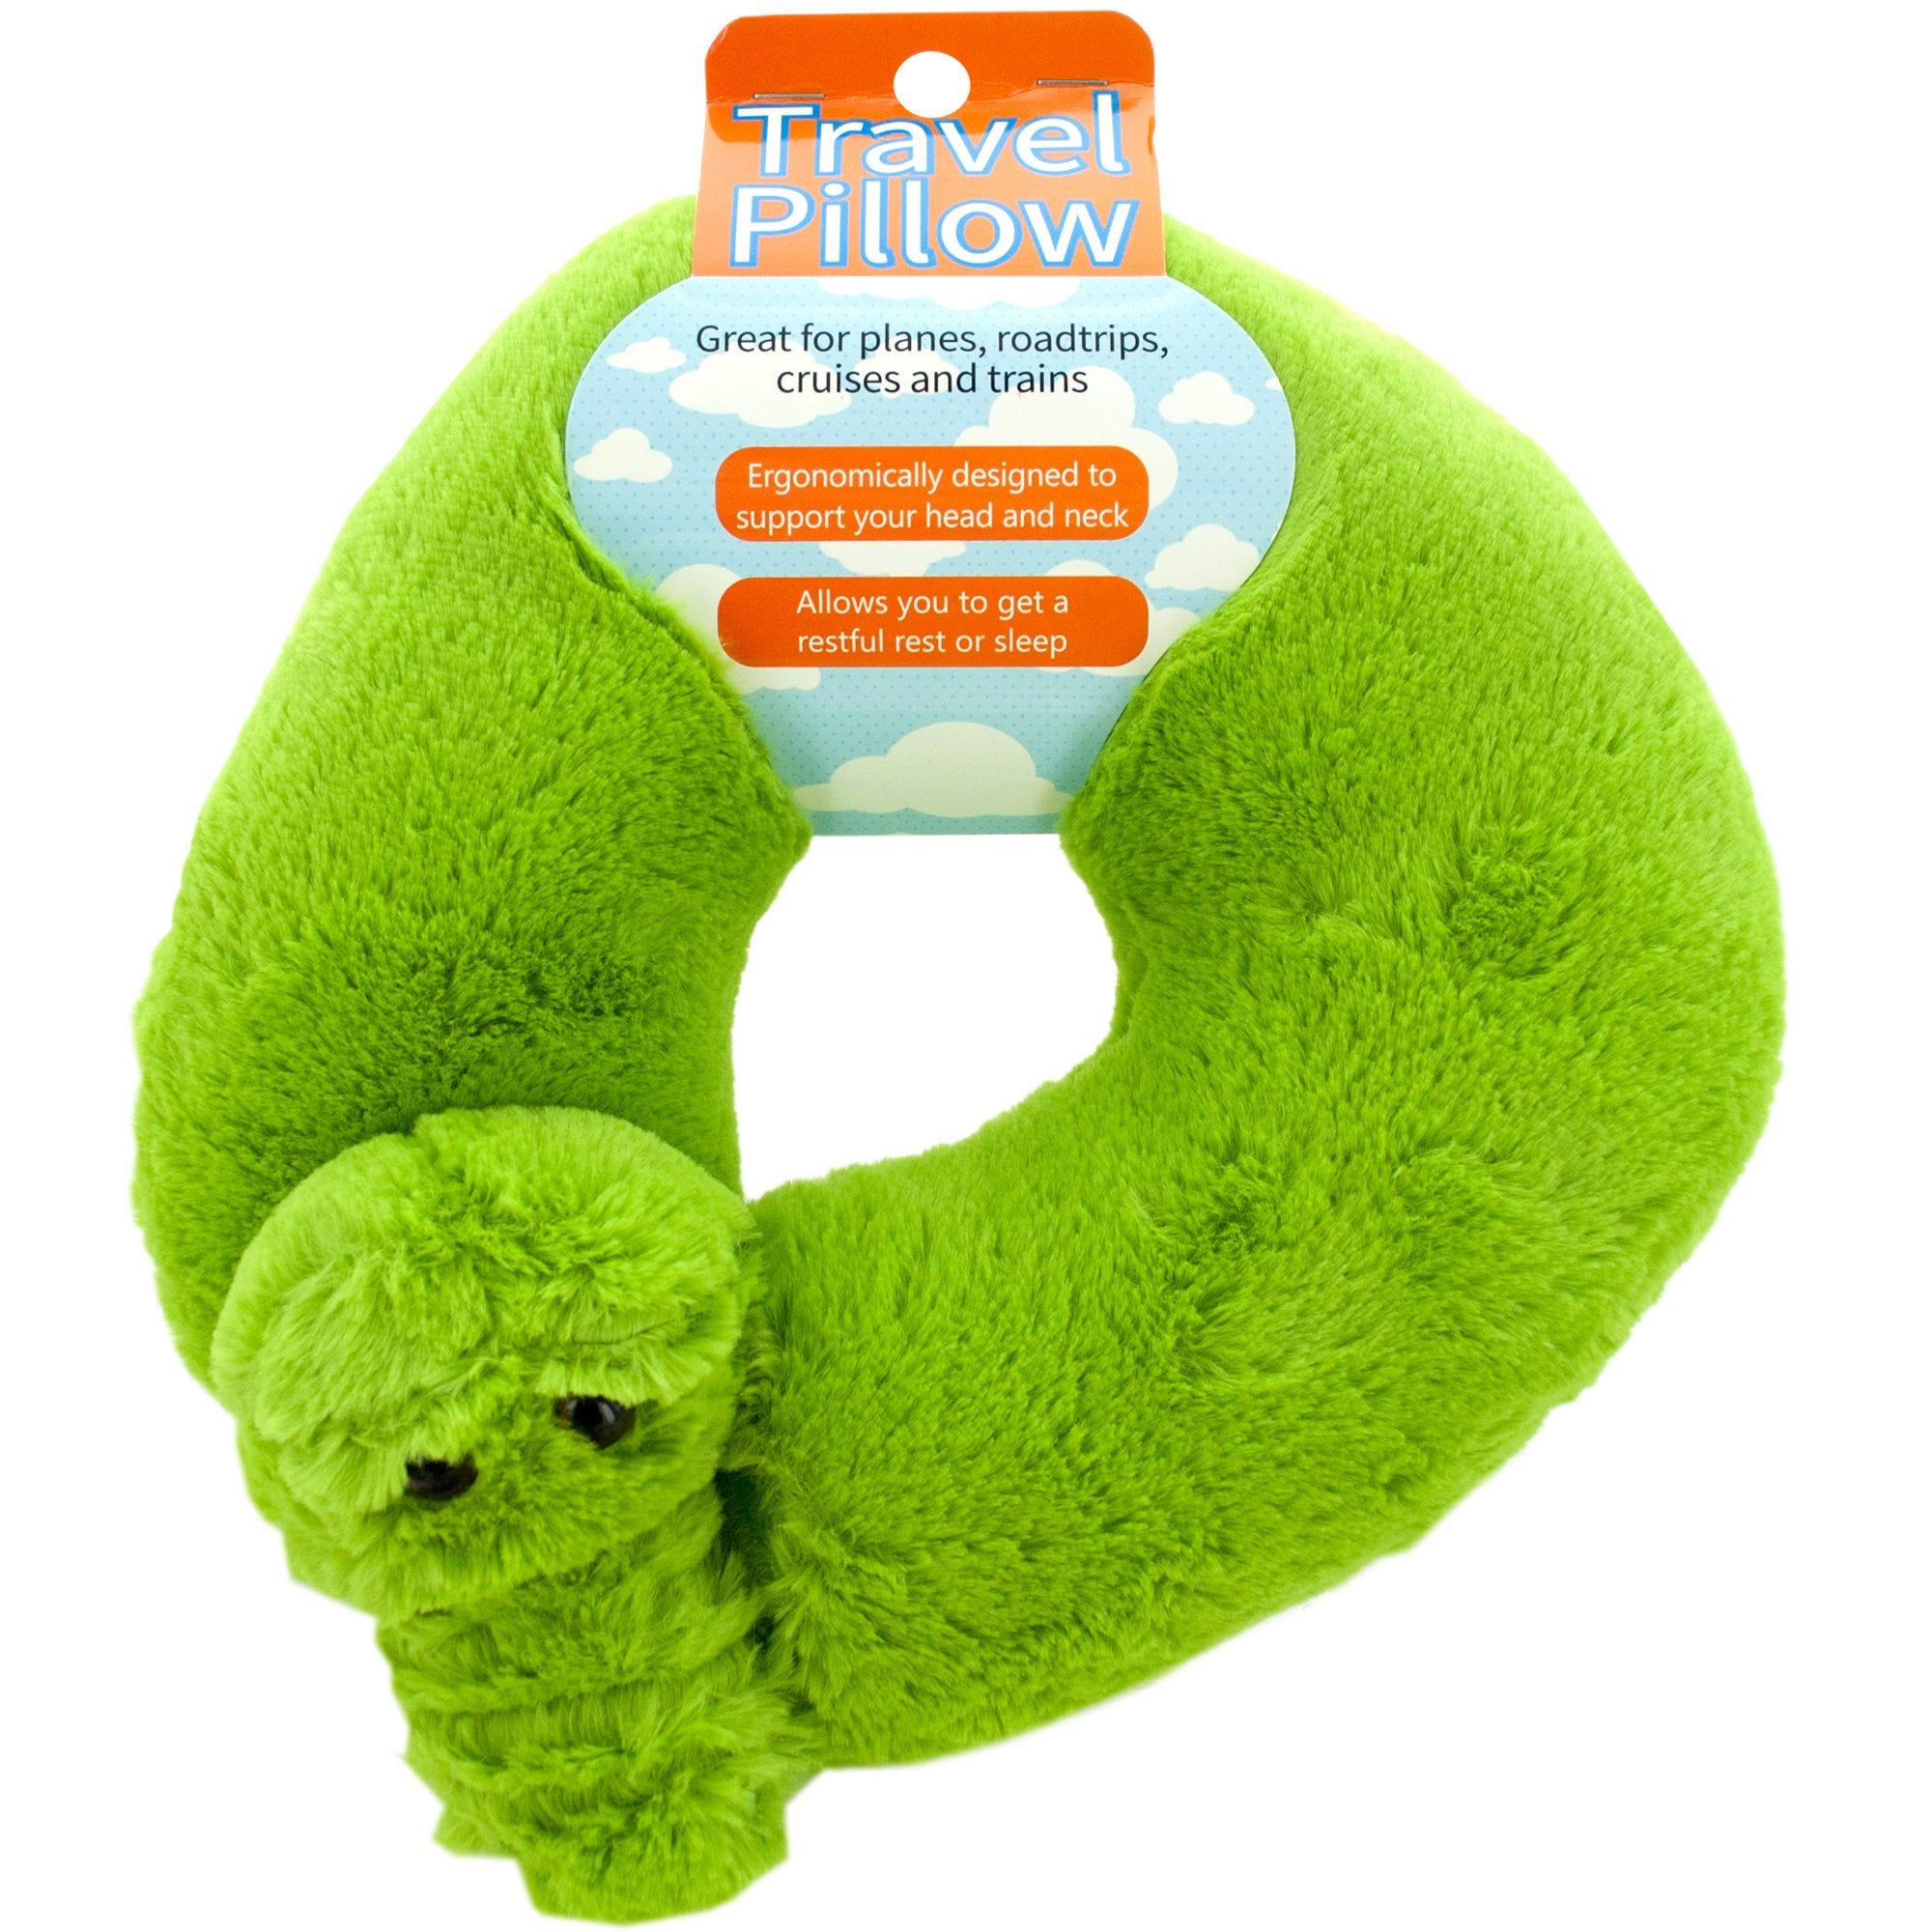 Plush Alligator Travel Pillow